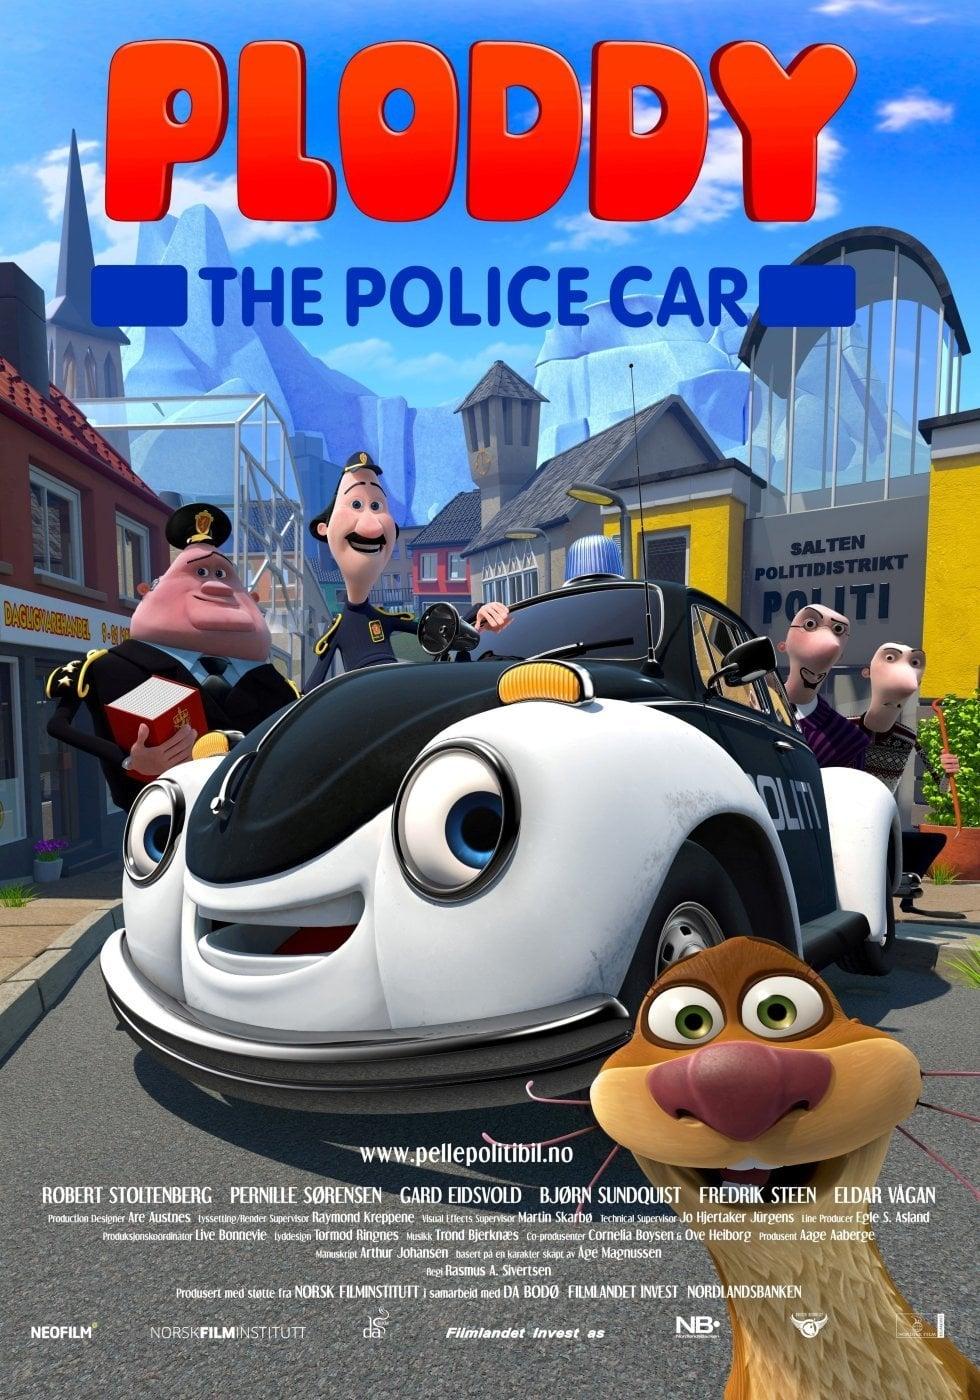 Ploddy the Police Car Makes a Splash